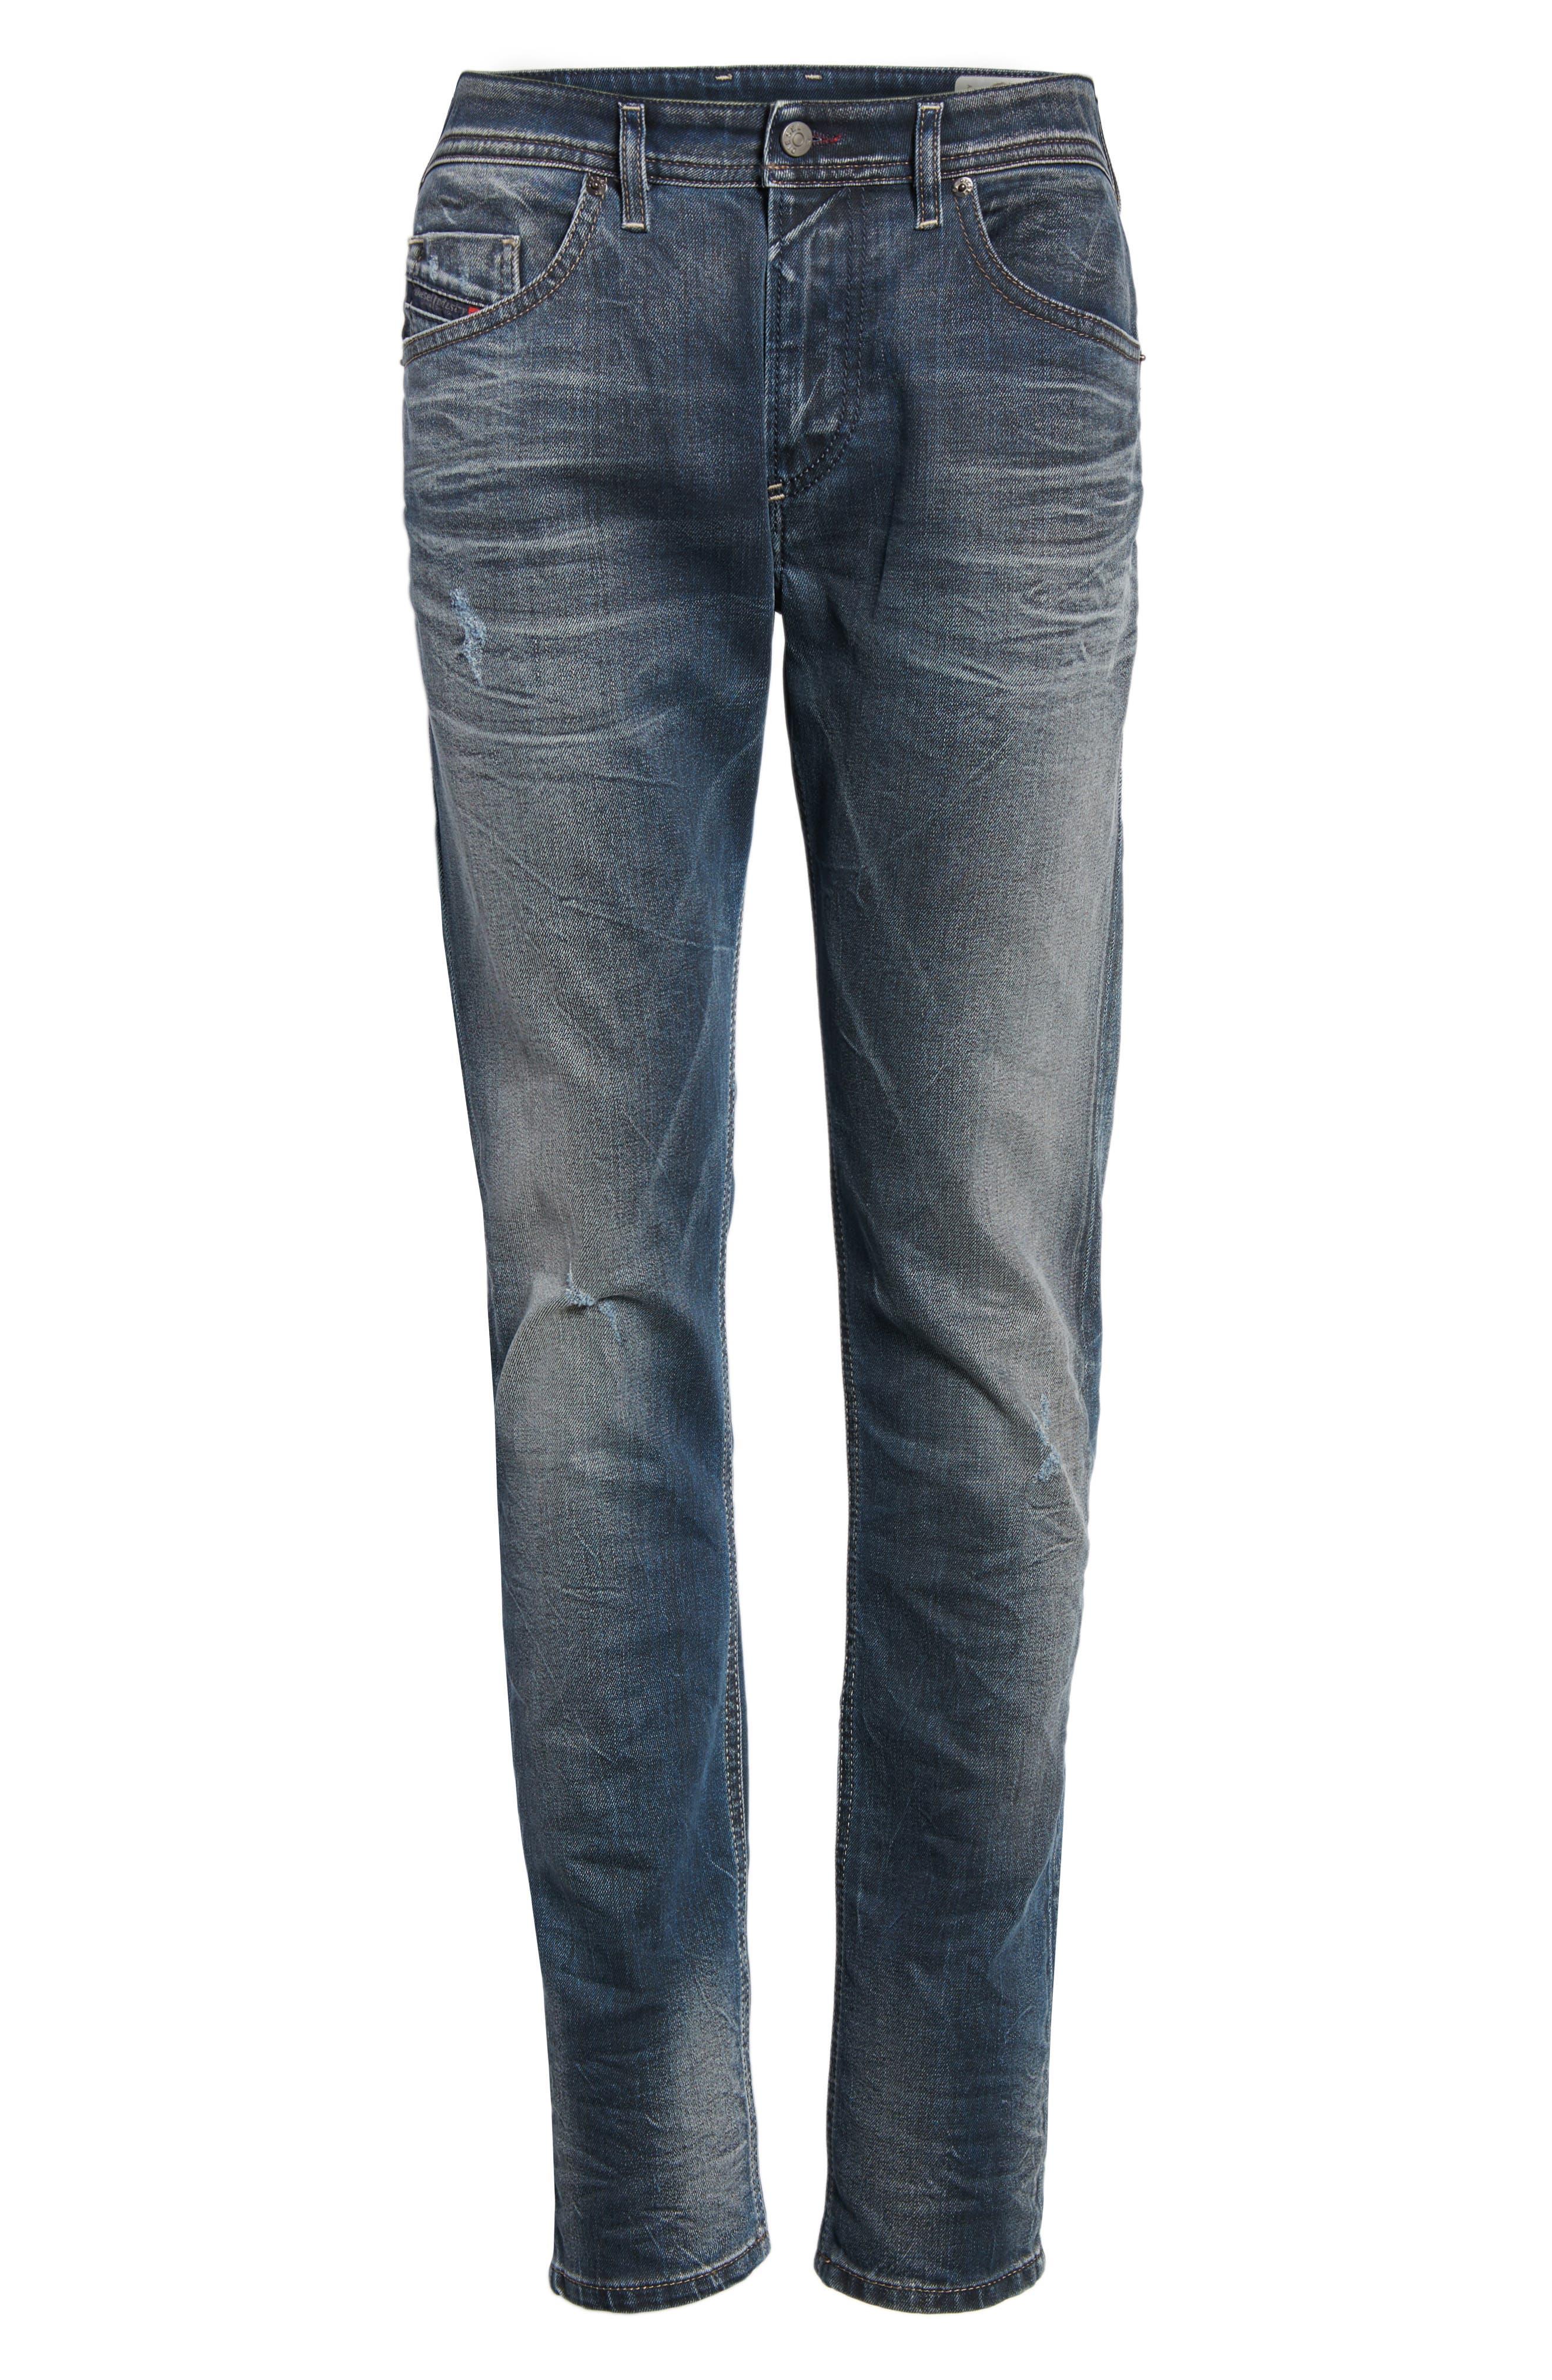 Thommer Slim Fit Jeans,                             Alternate thumbnail 6, color,                             400